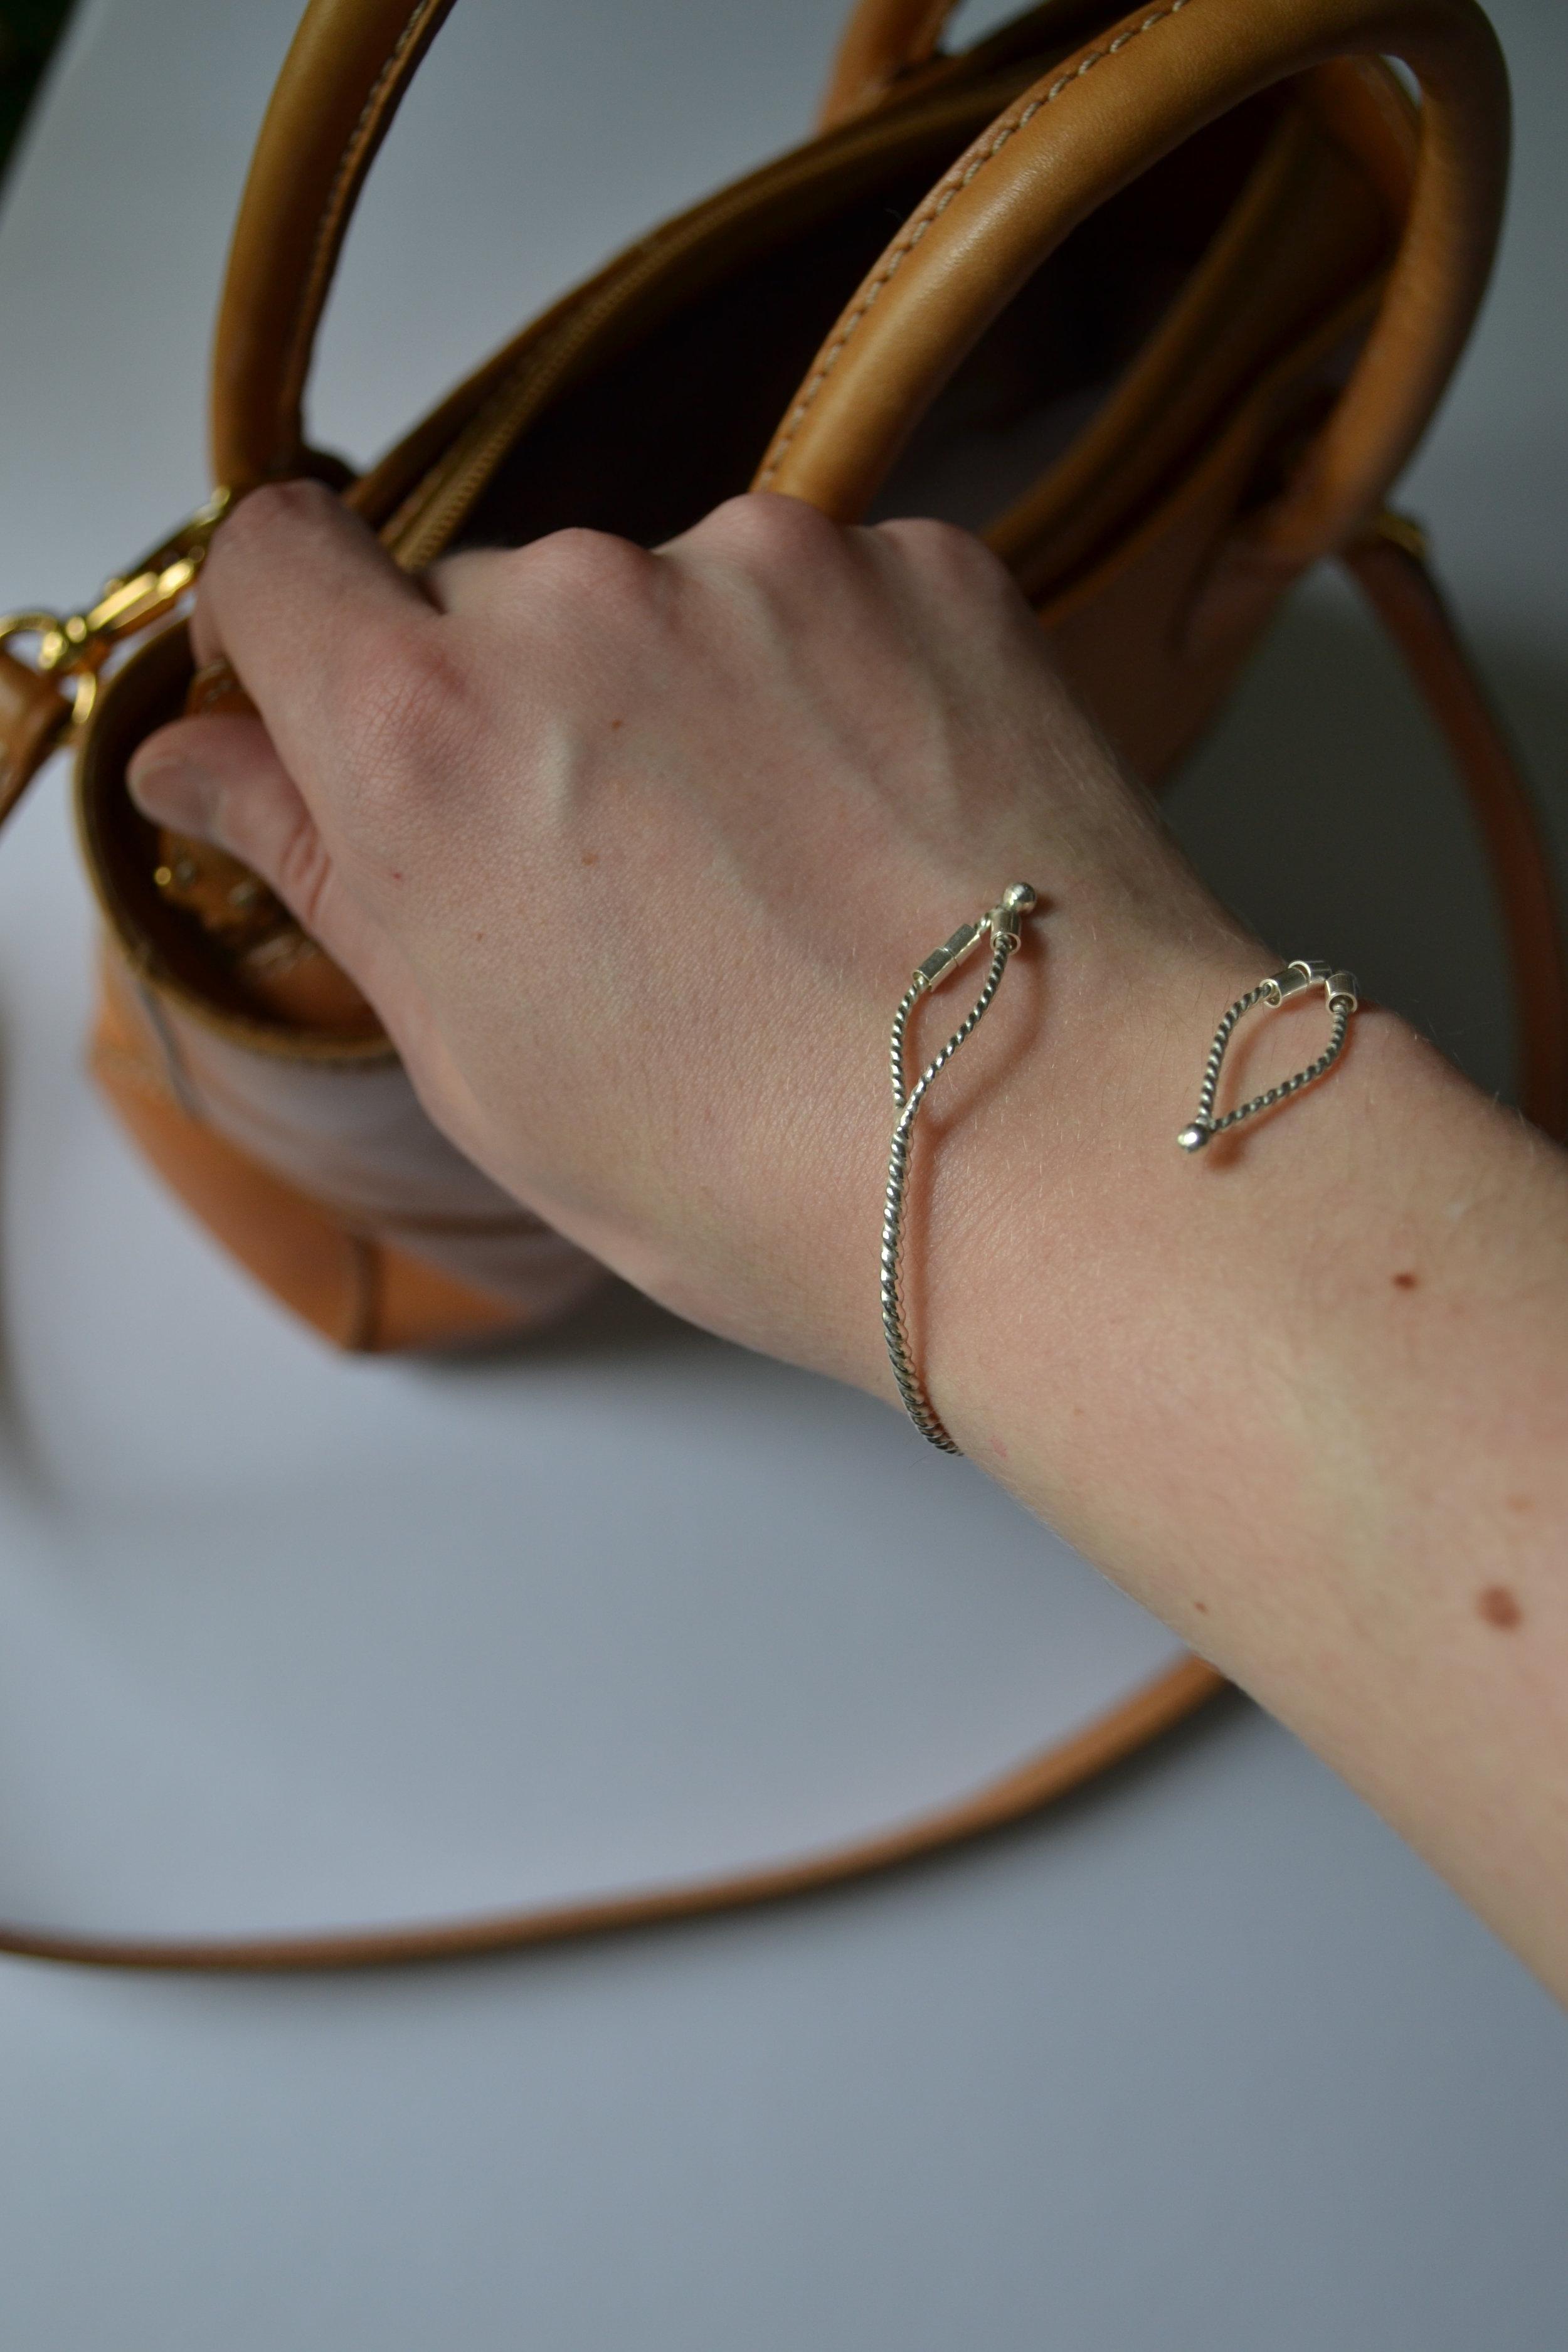 Petal Bracelet - Sterling silver  - Handcrafted - lewdesigns.com.JPG